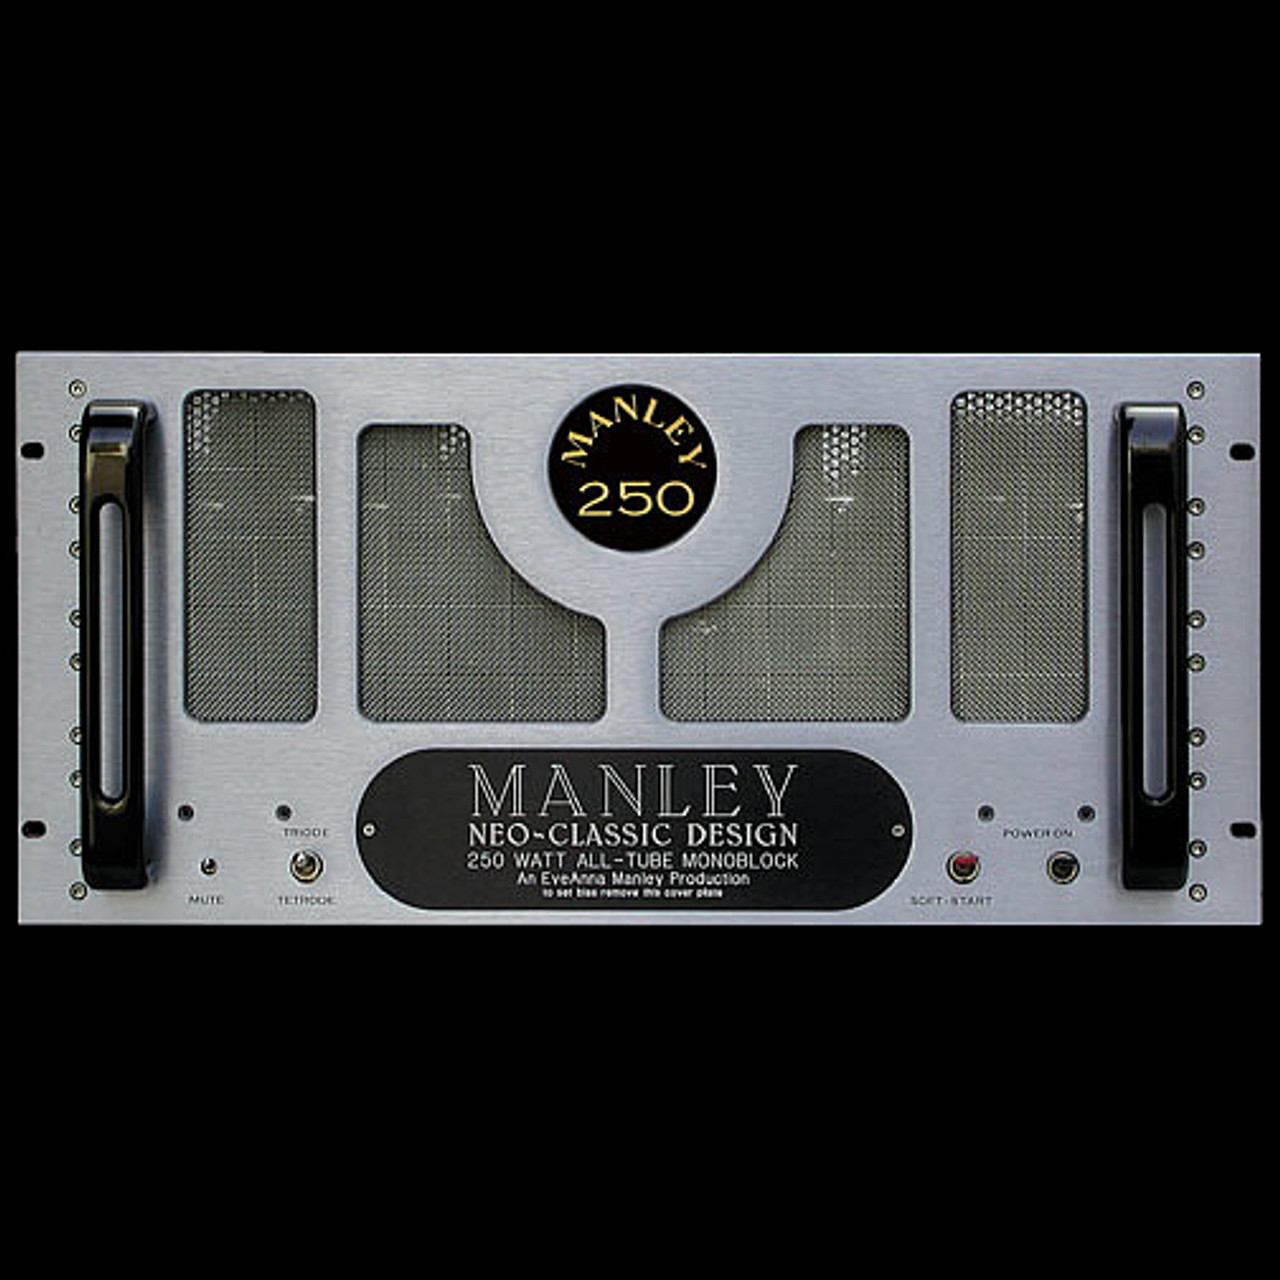 Manley Neo-Classic 250 monoblock amplifiers